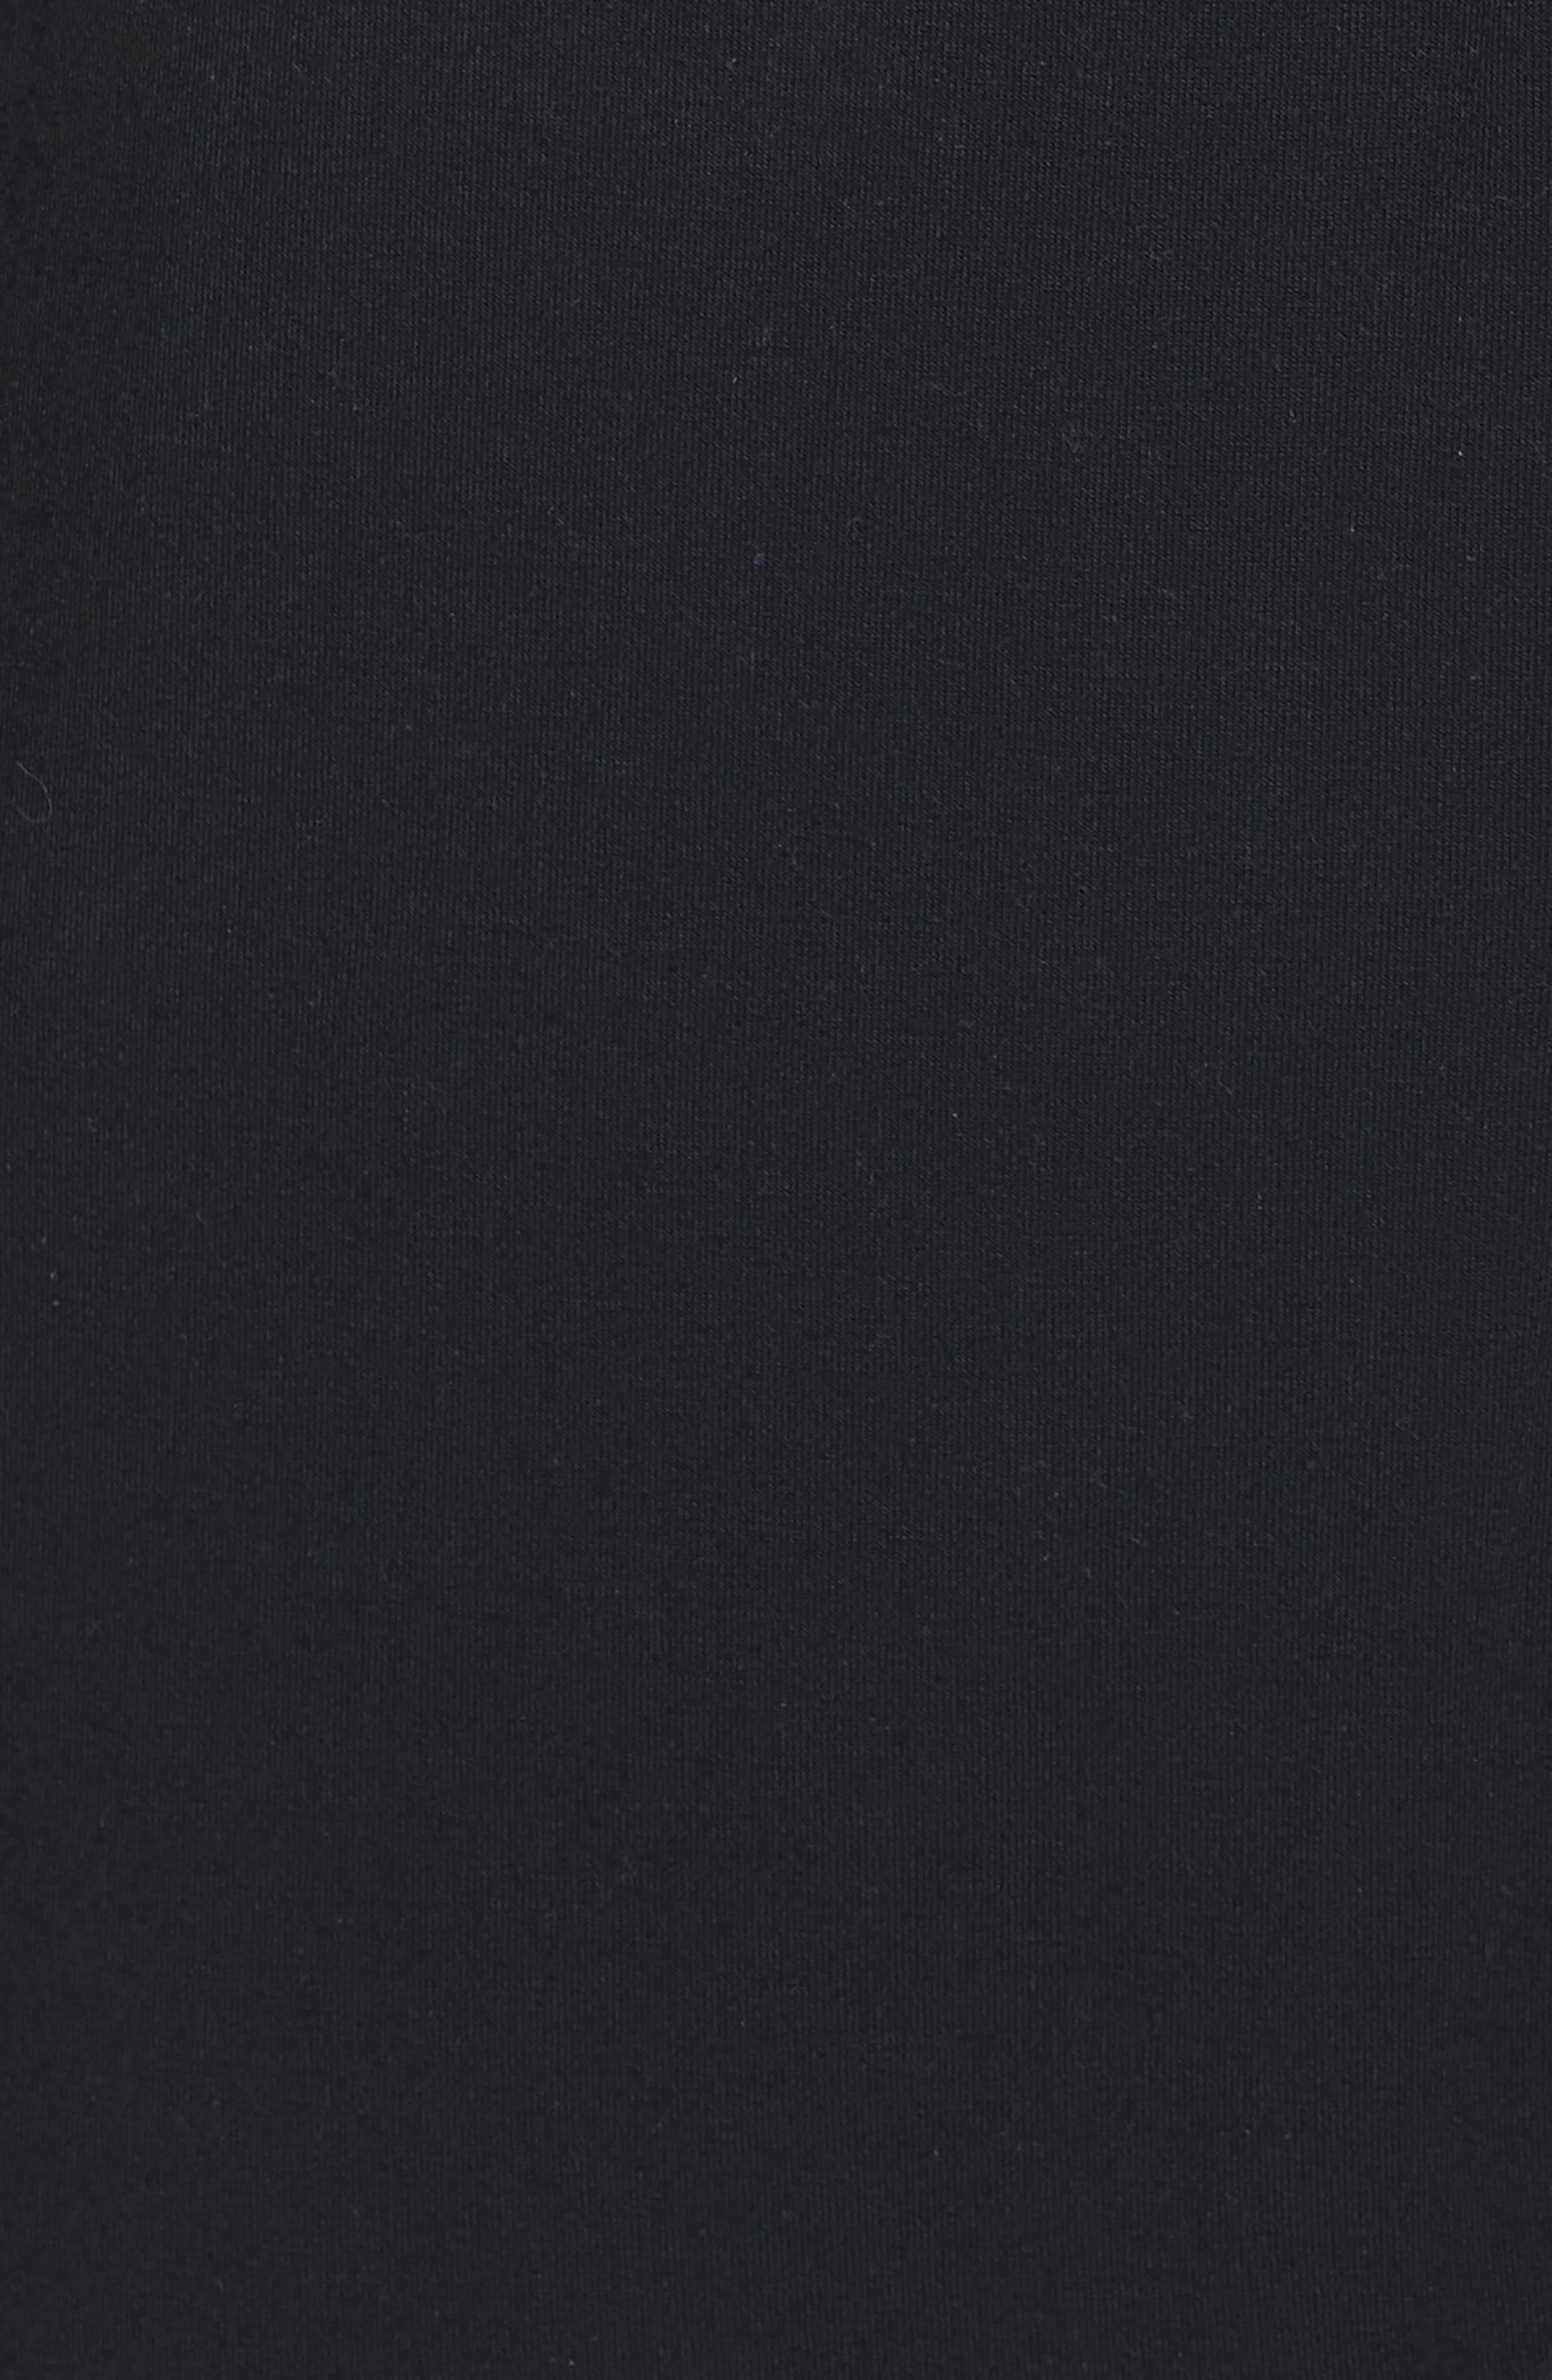 NORDSTROM LINGERIE,                             Nightshirt,                             Alternate thumbnail 5, color,                             BLACK